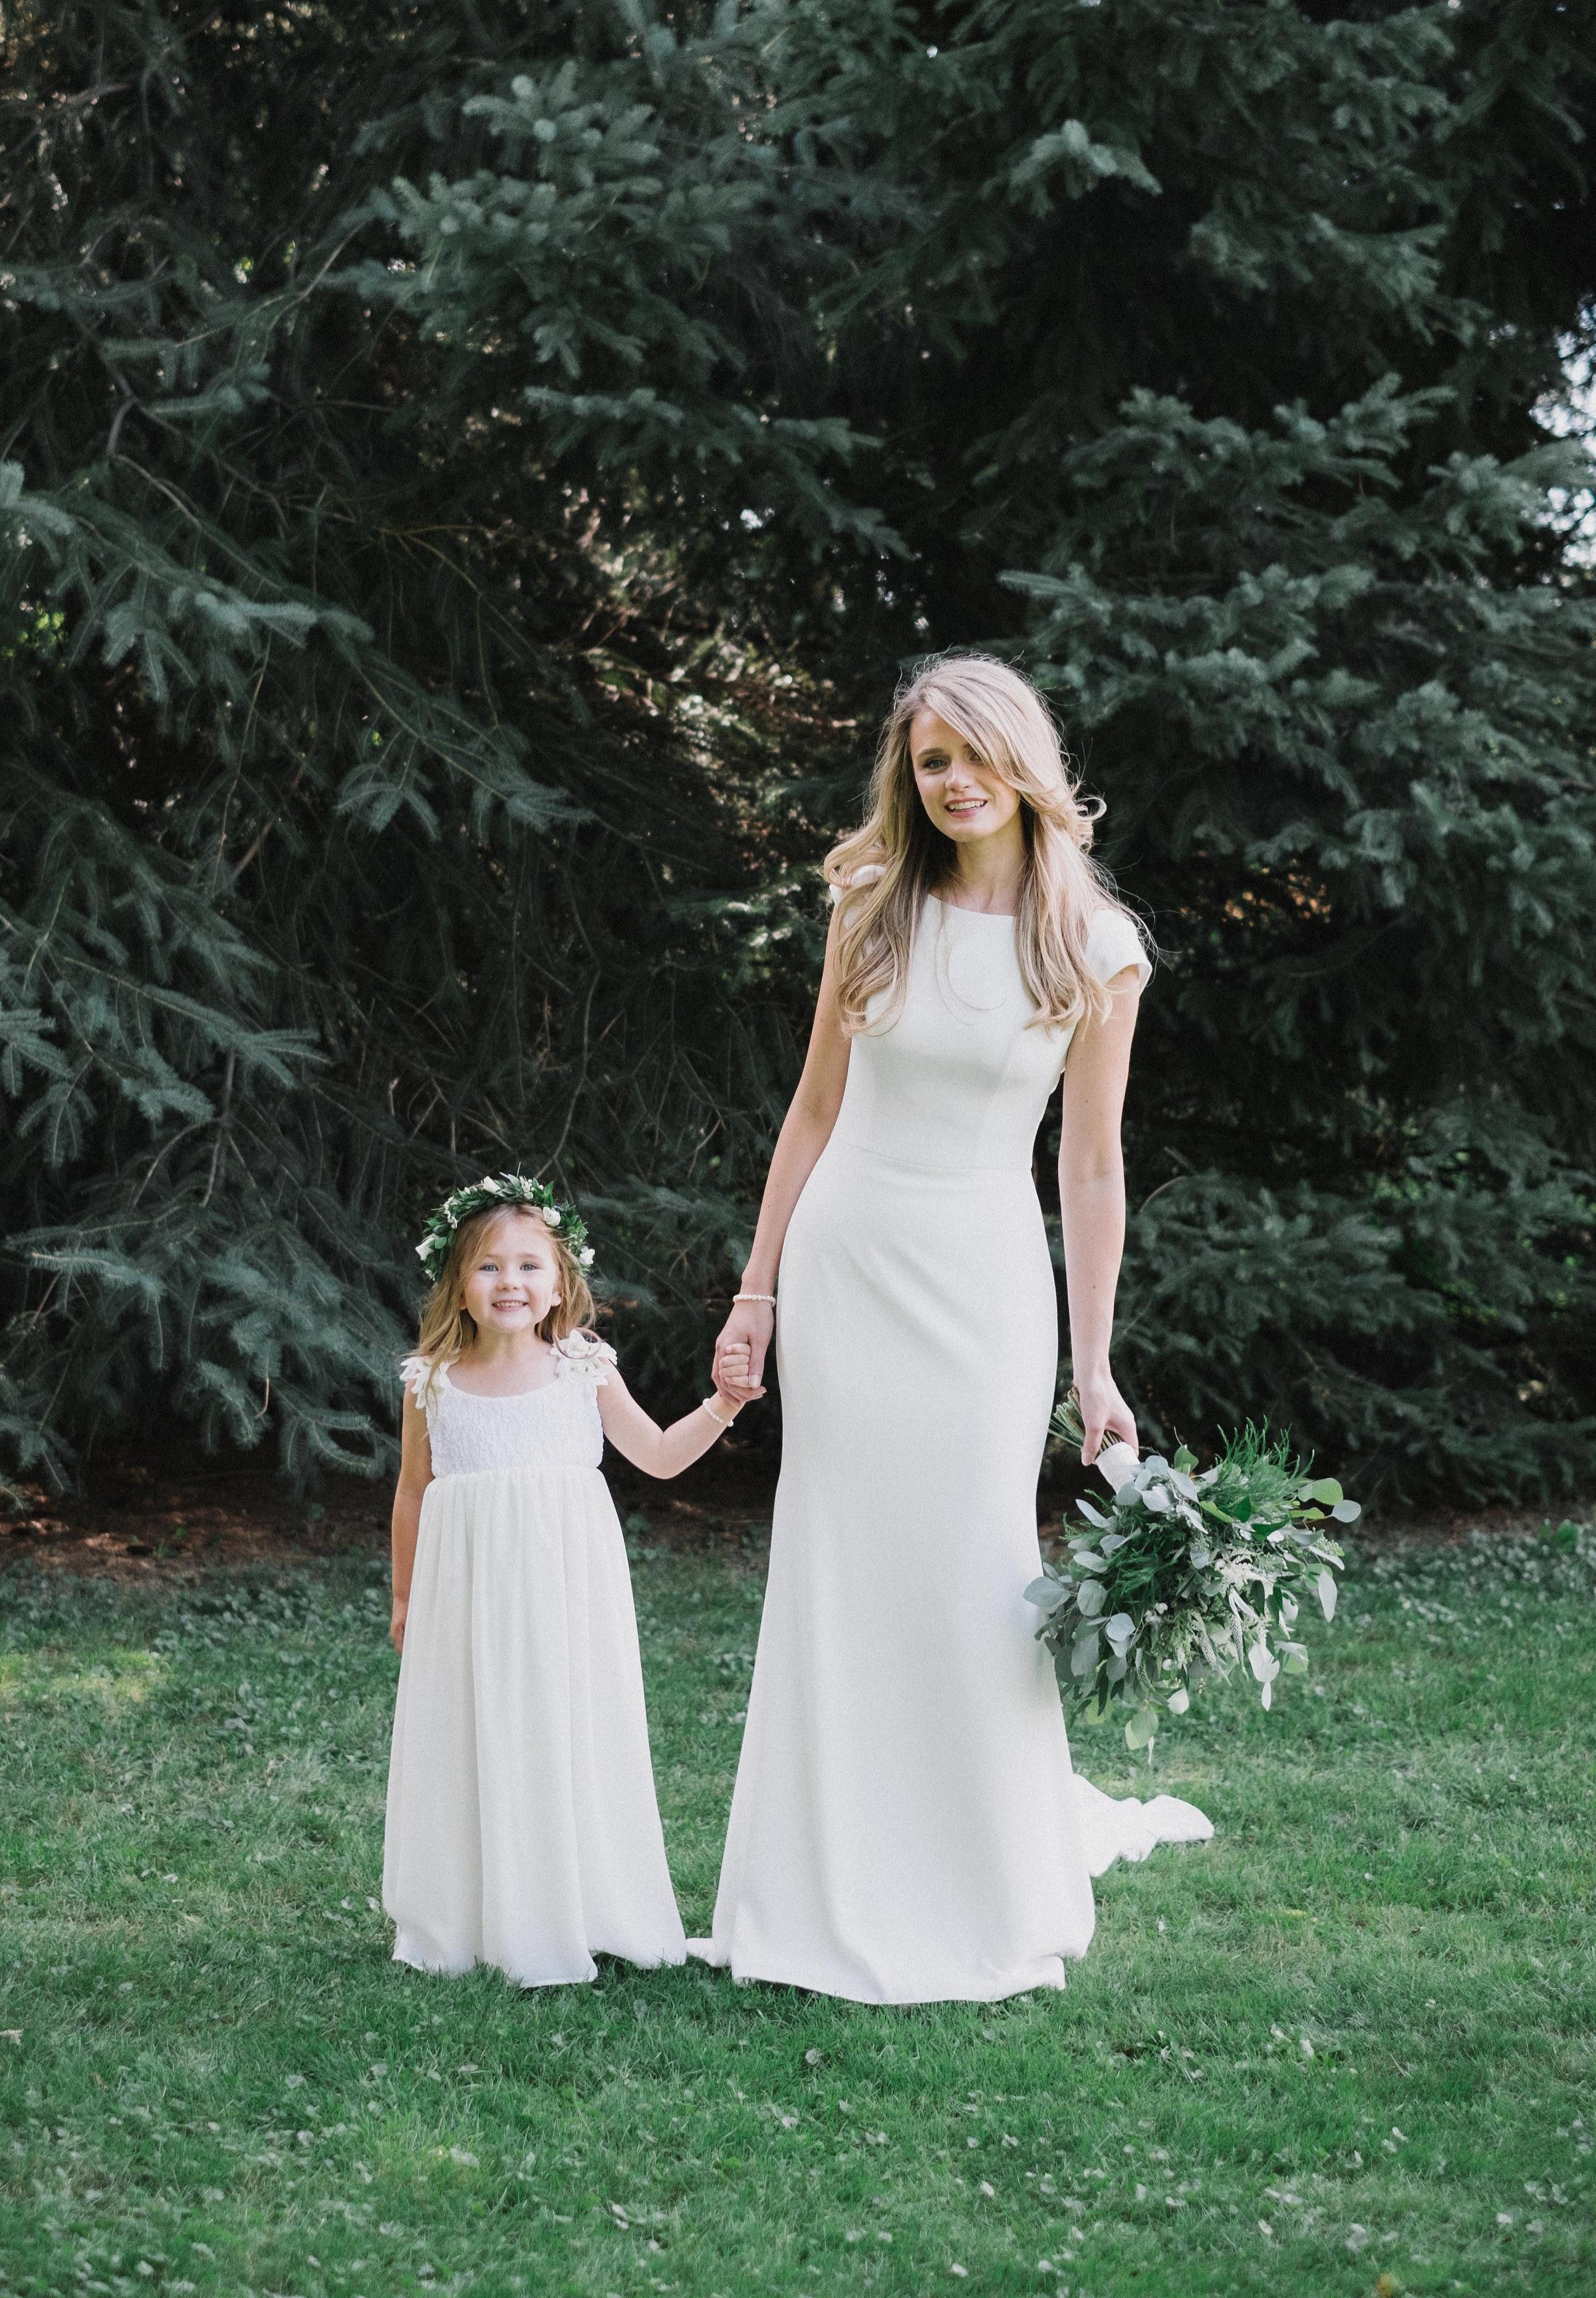 Danika-Mike-Veerman-Wedding-Spice-Factory-Hamilton-INLY-Events-TJ-Tindale-204.jpg